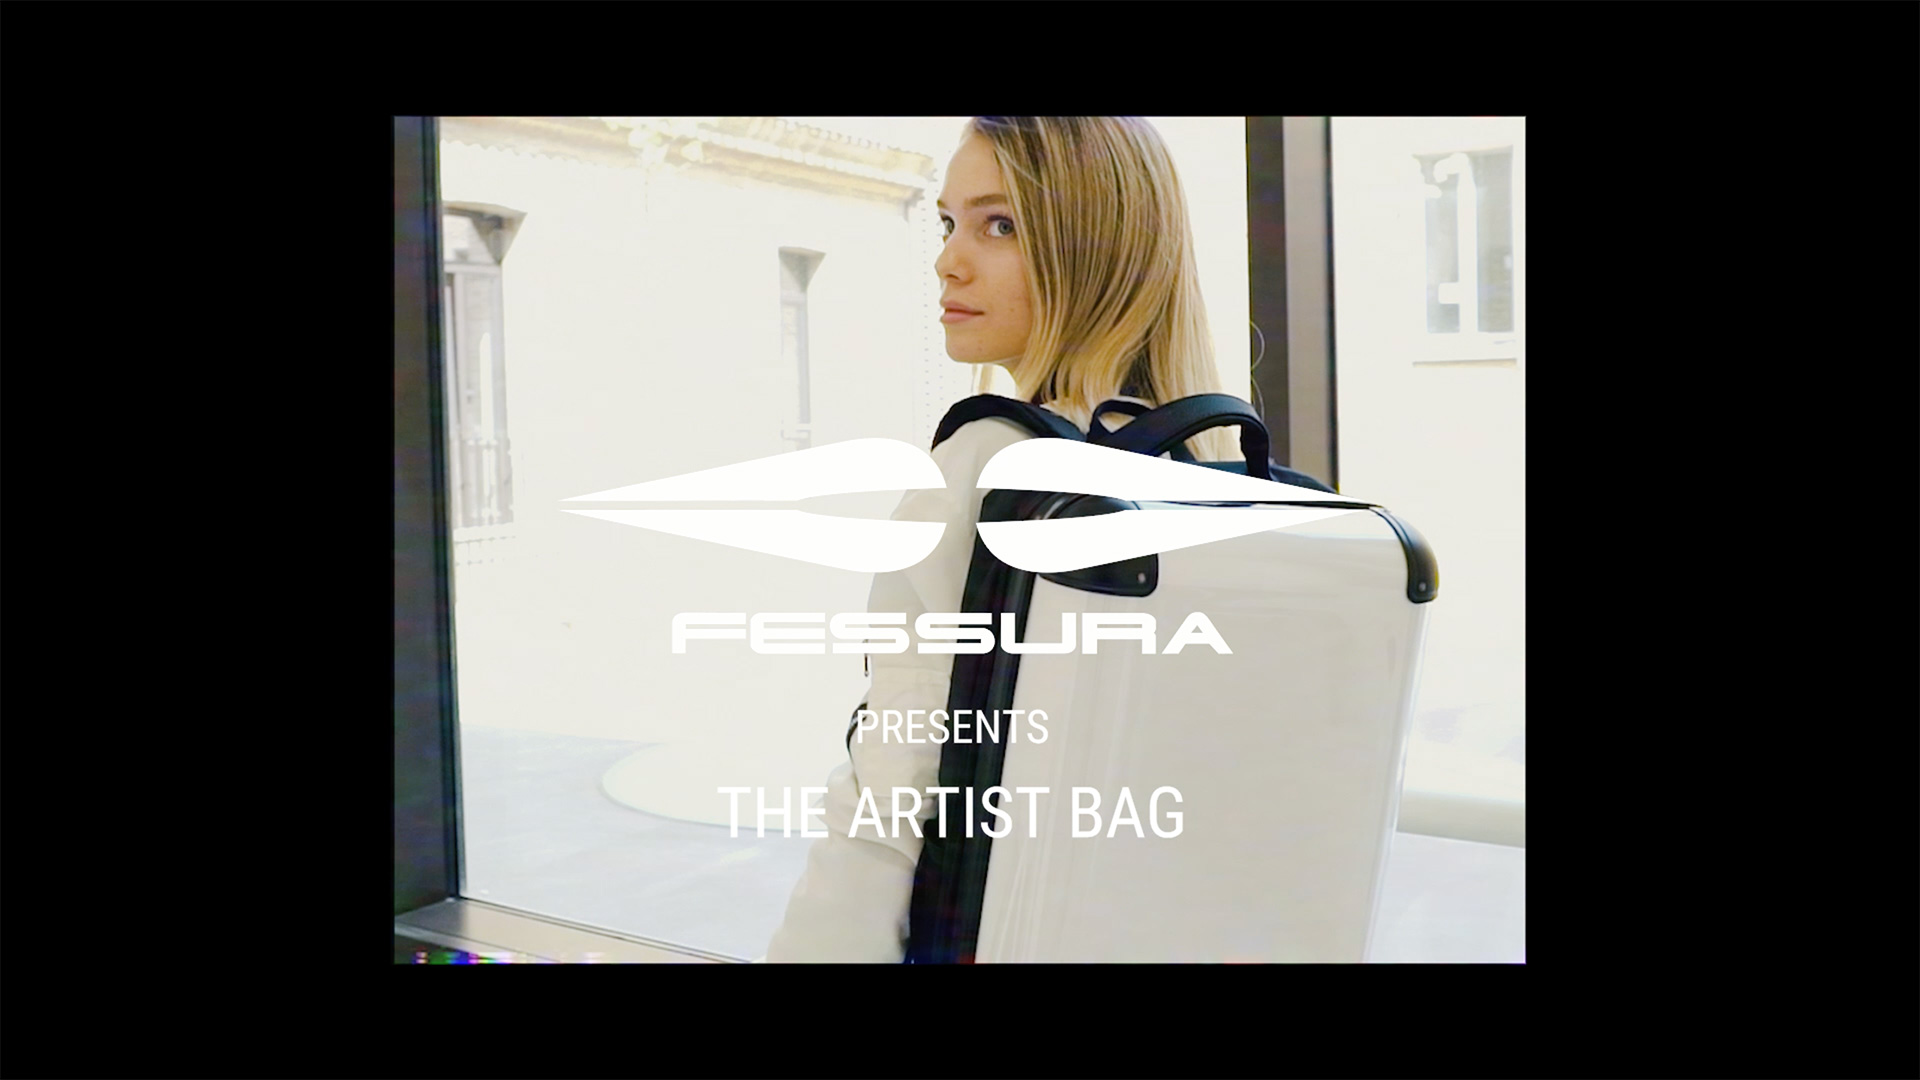 the artist bag